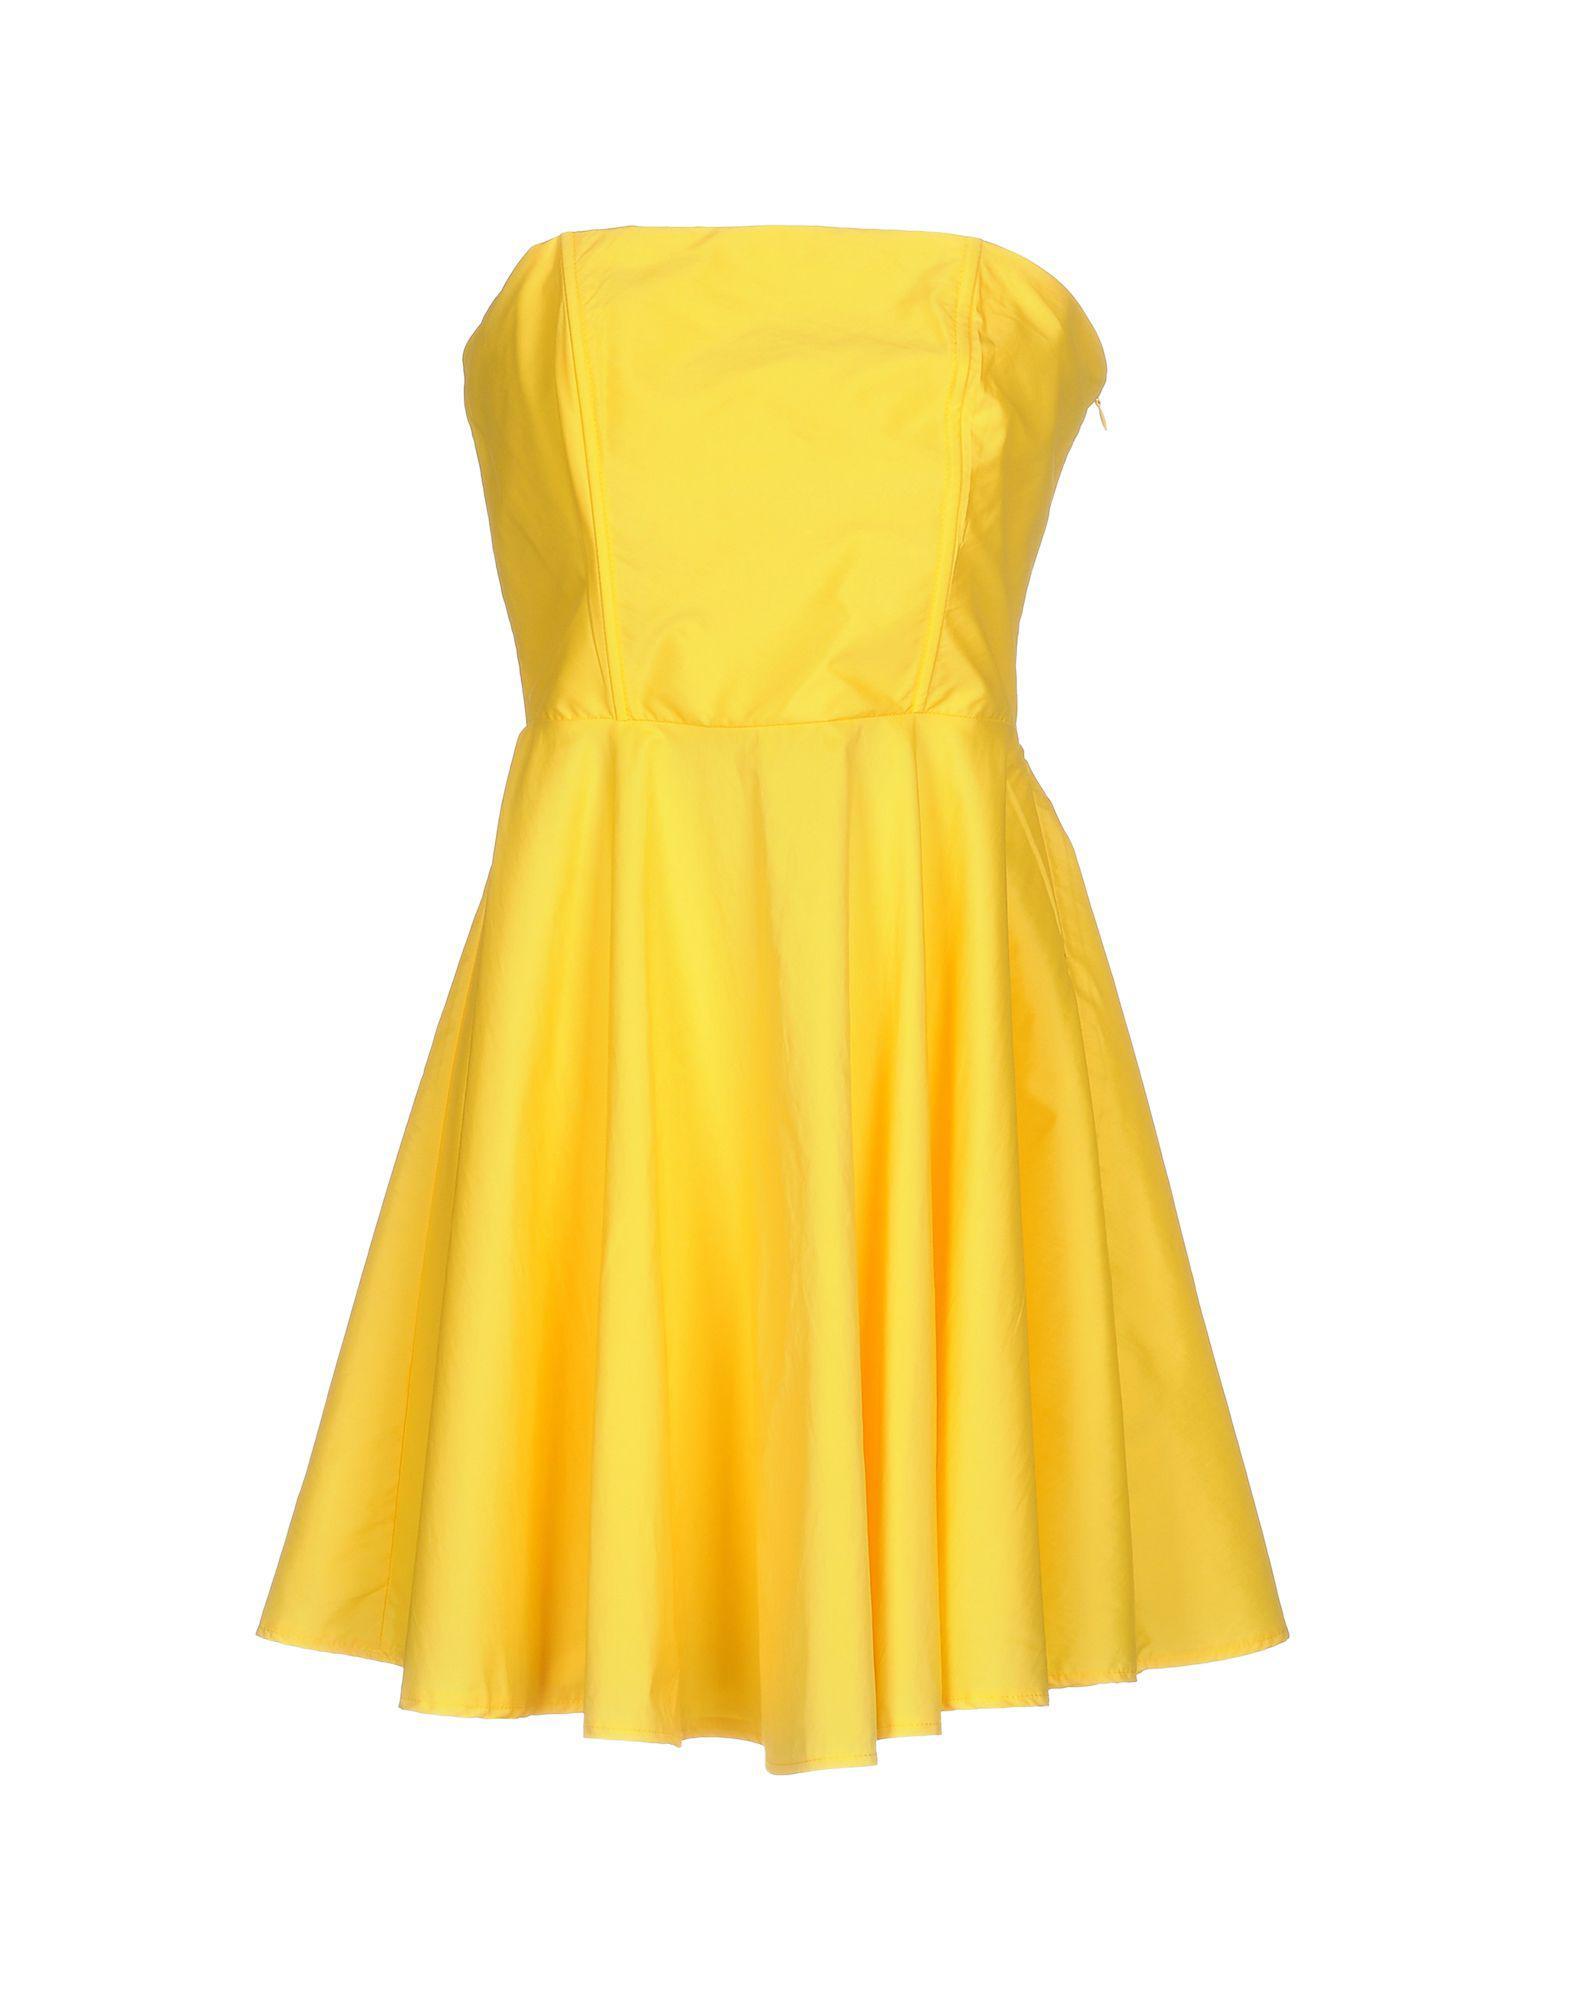 DRESSES - Short dresses Shi 4 3FsQHs8